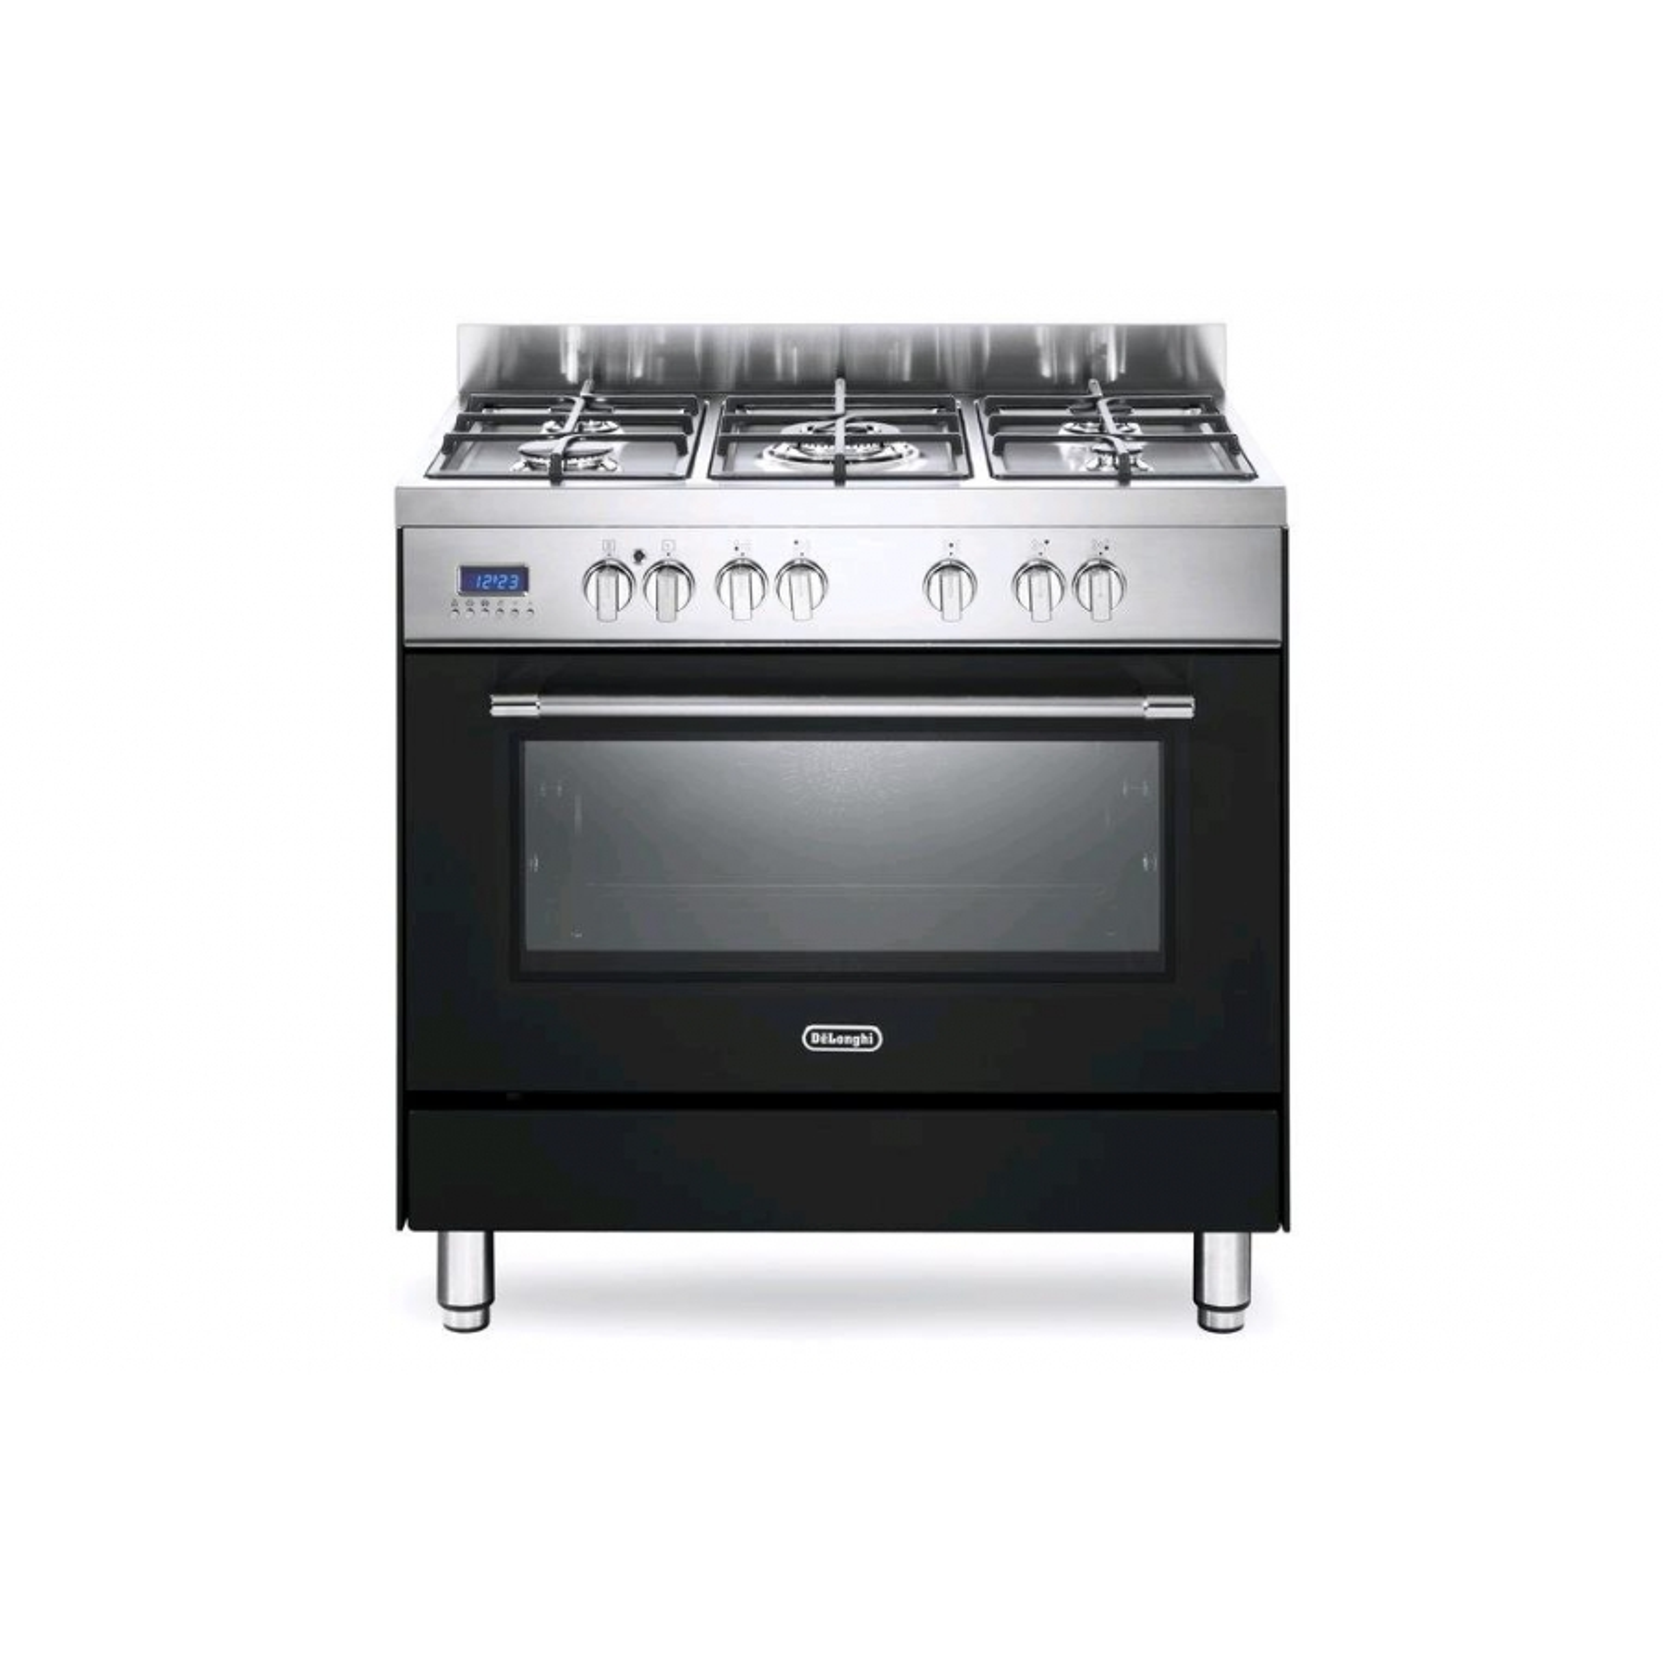 De longhi pro96ma cucina a gas forno elettrico multifunzione 90x60cm classe a antracite garanzia - Cucina elettrica de longhi ...